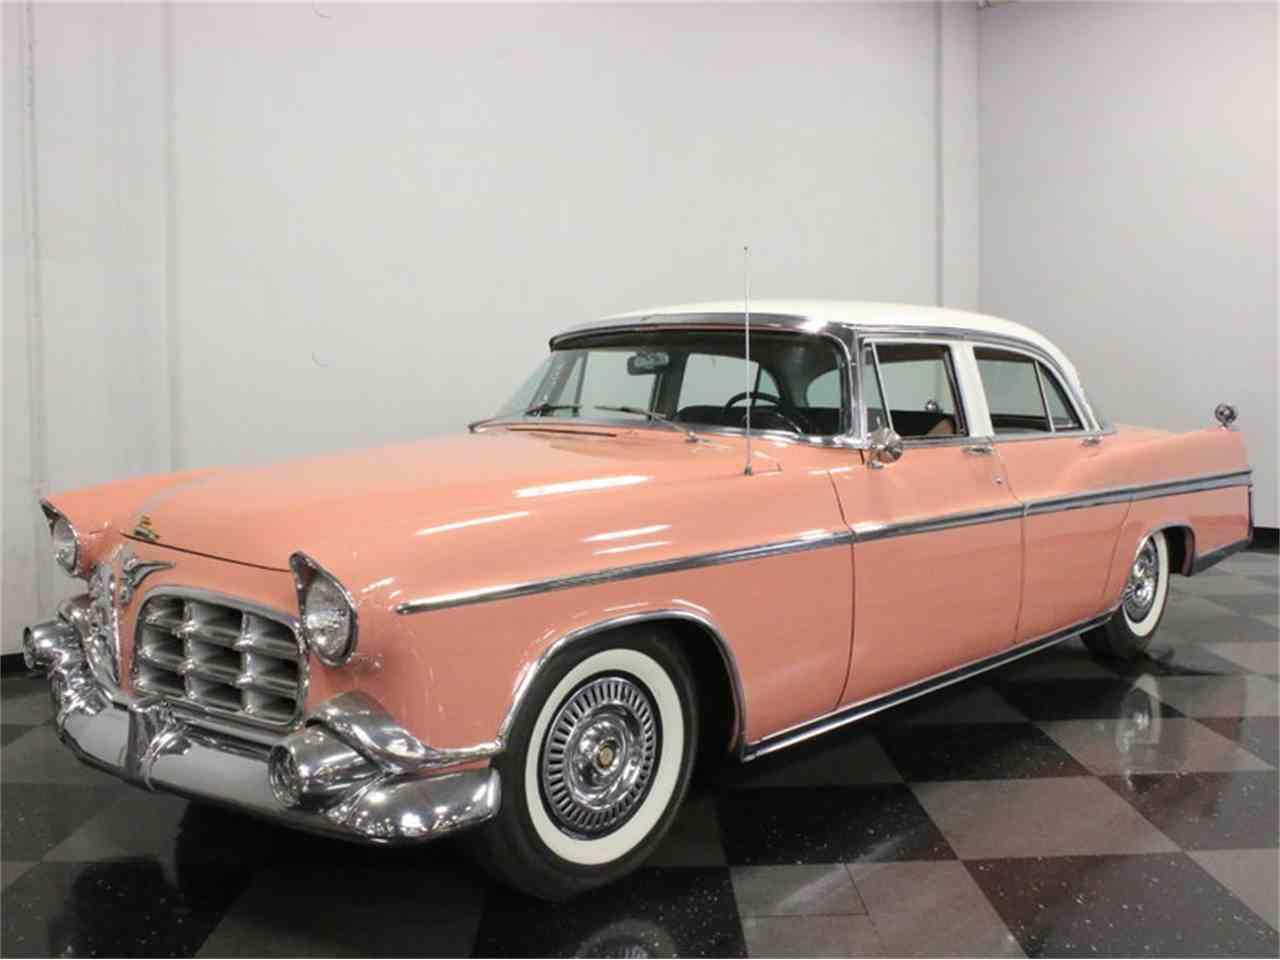 auction car tx fort public worth chrysler trinity img auto dallas texas cheap testimonials auctions vehicle